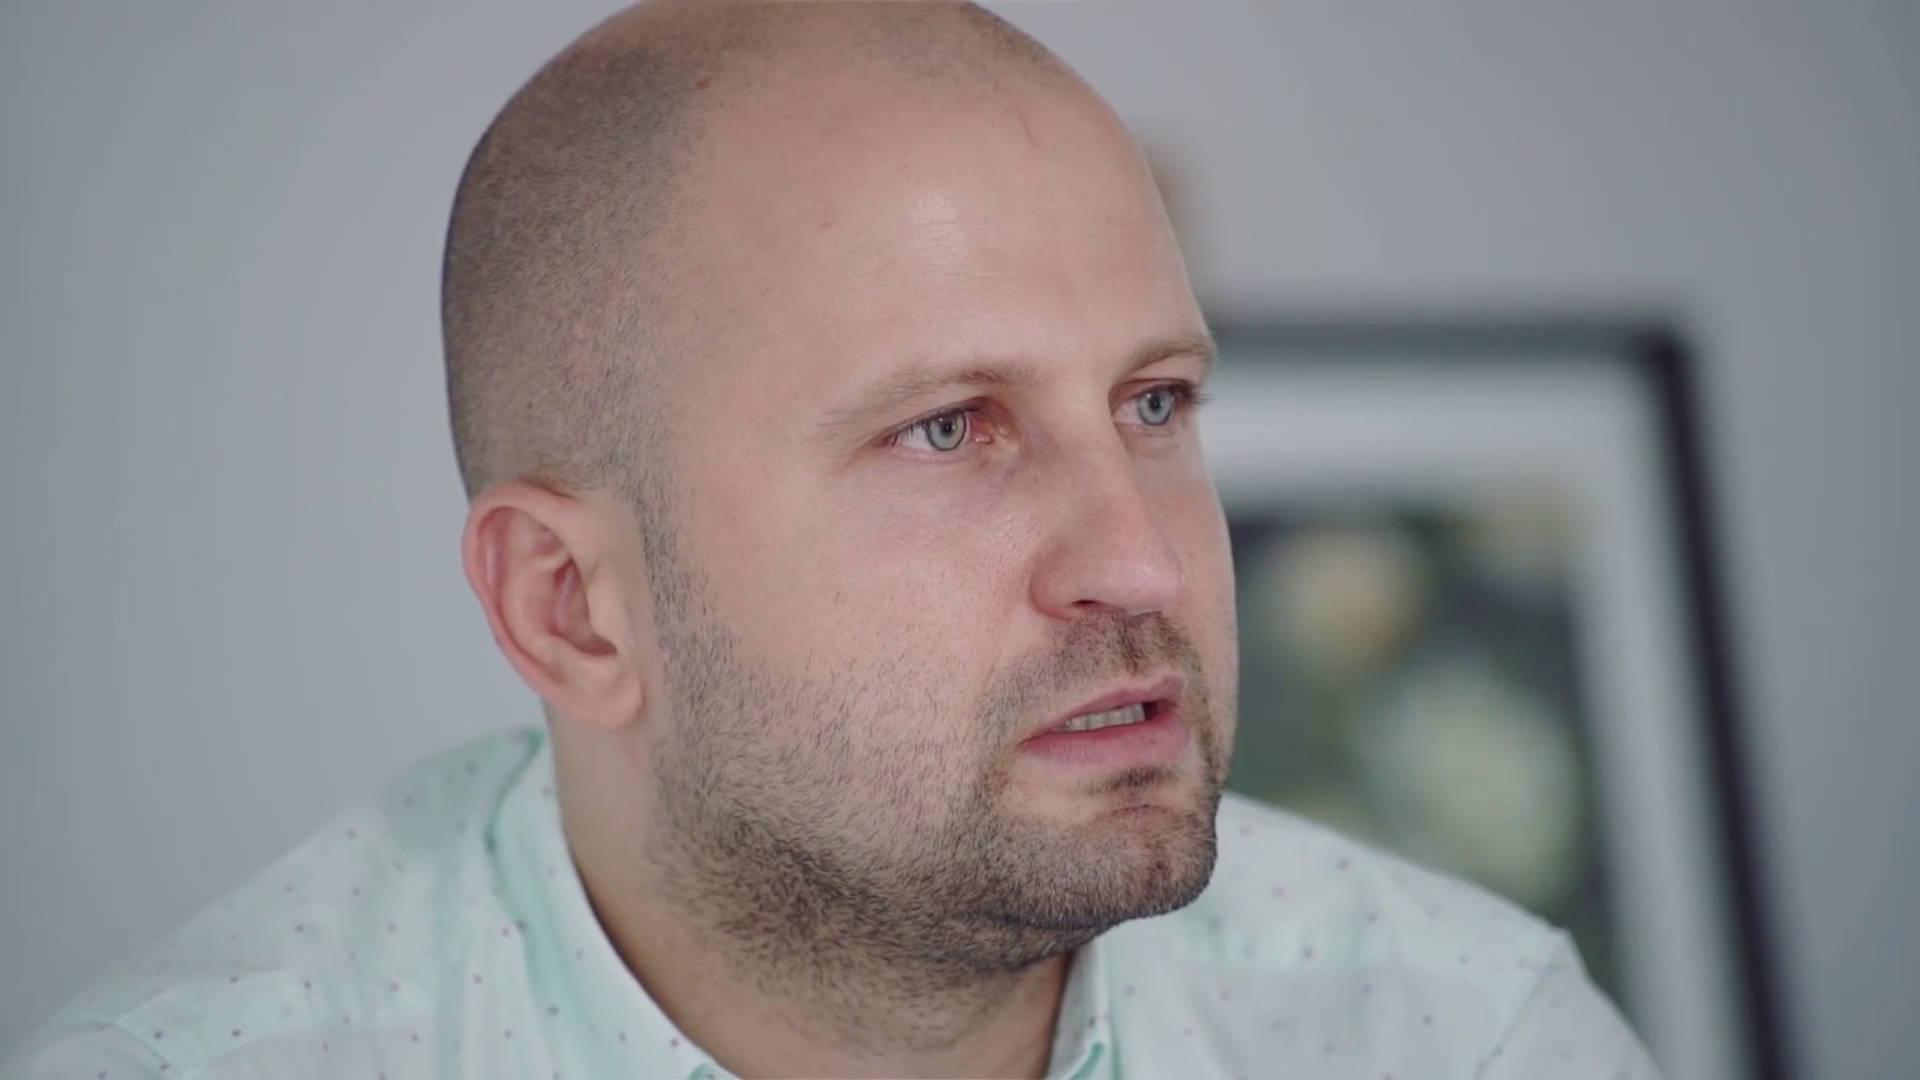 Video Testimonial Example